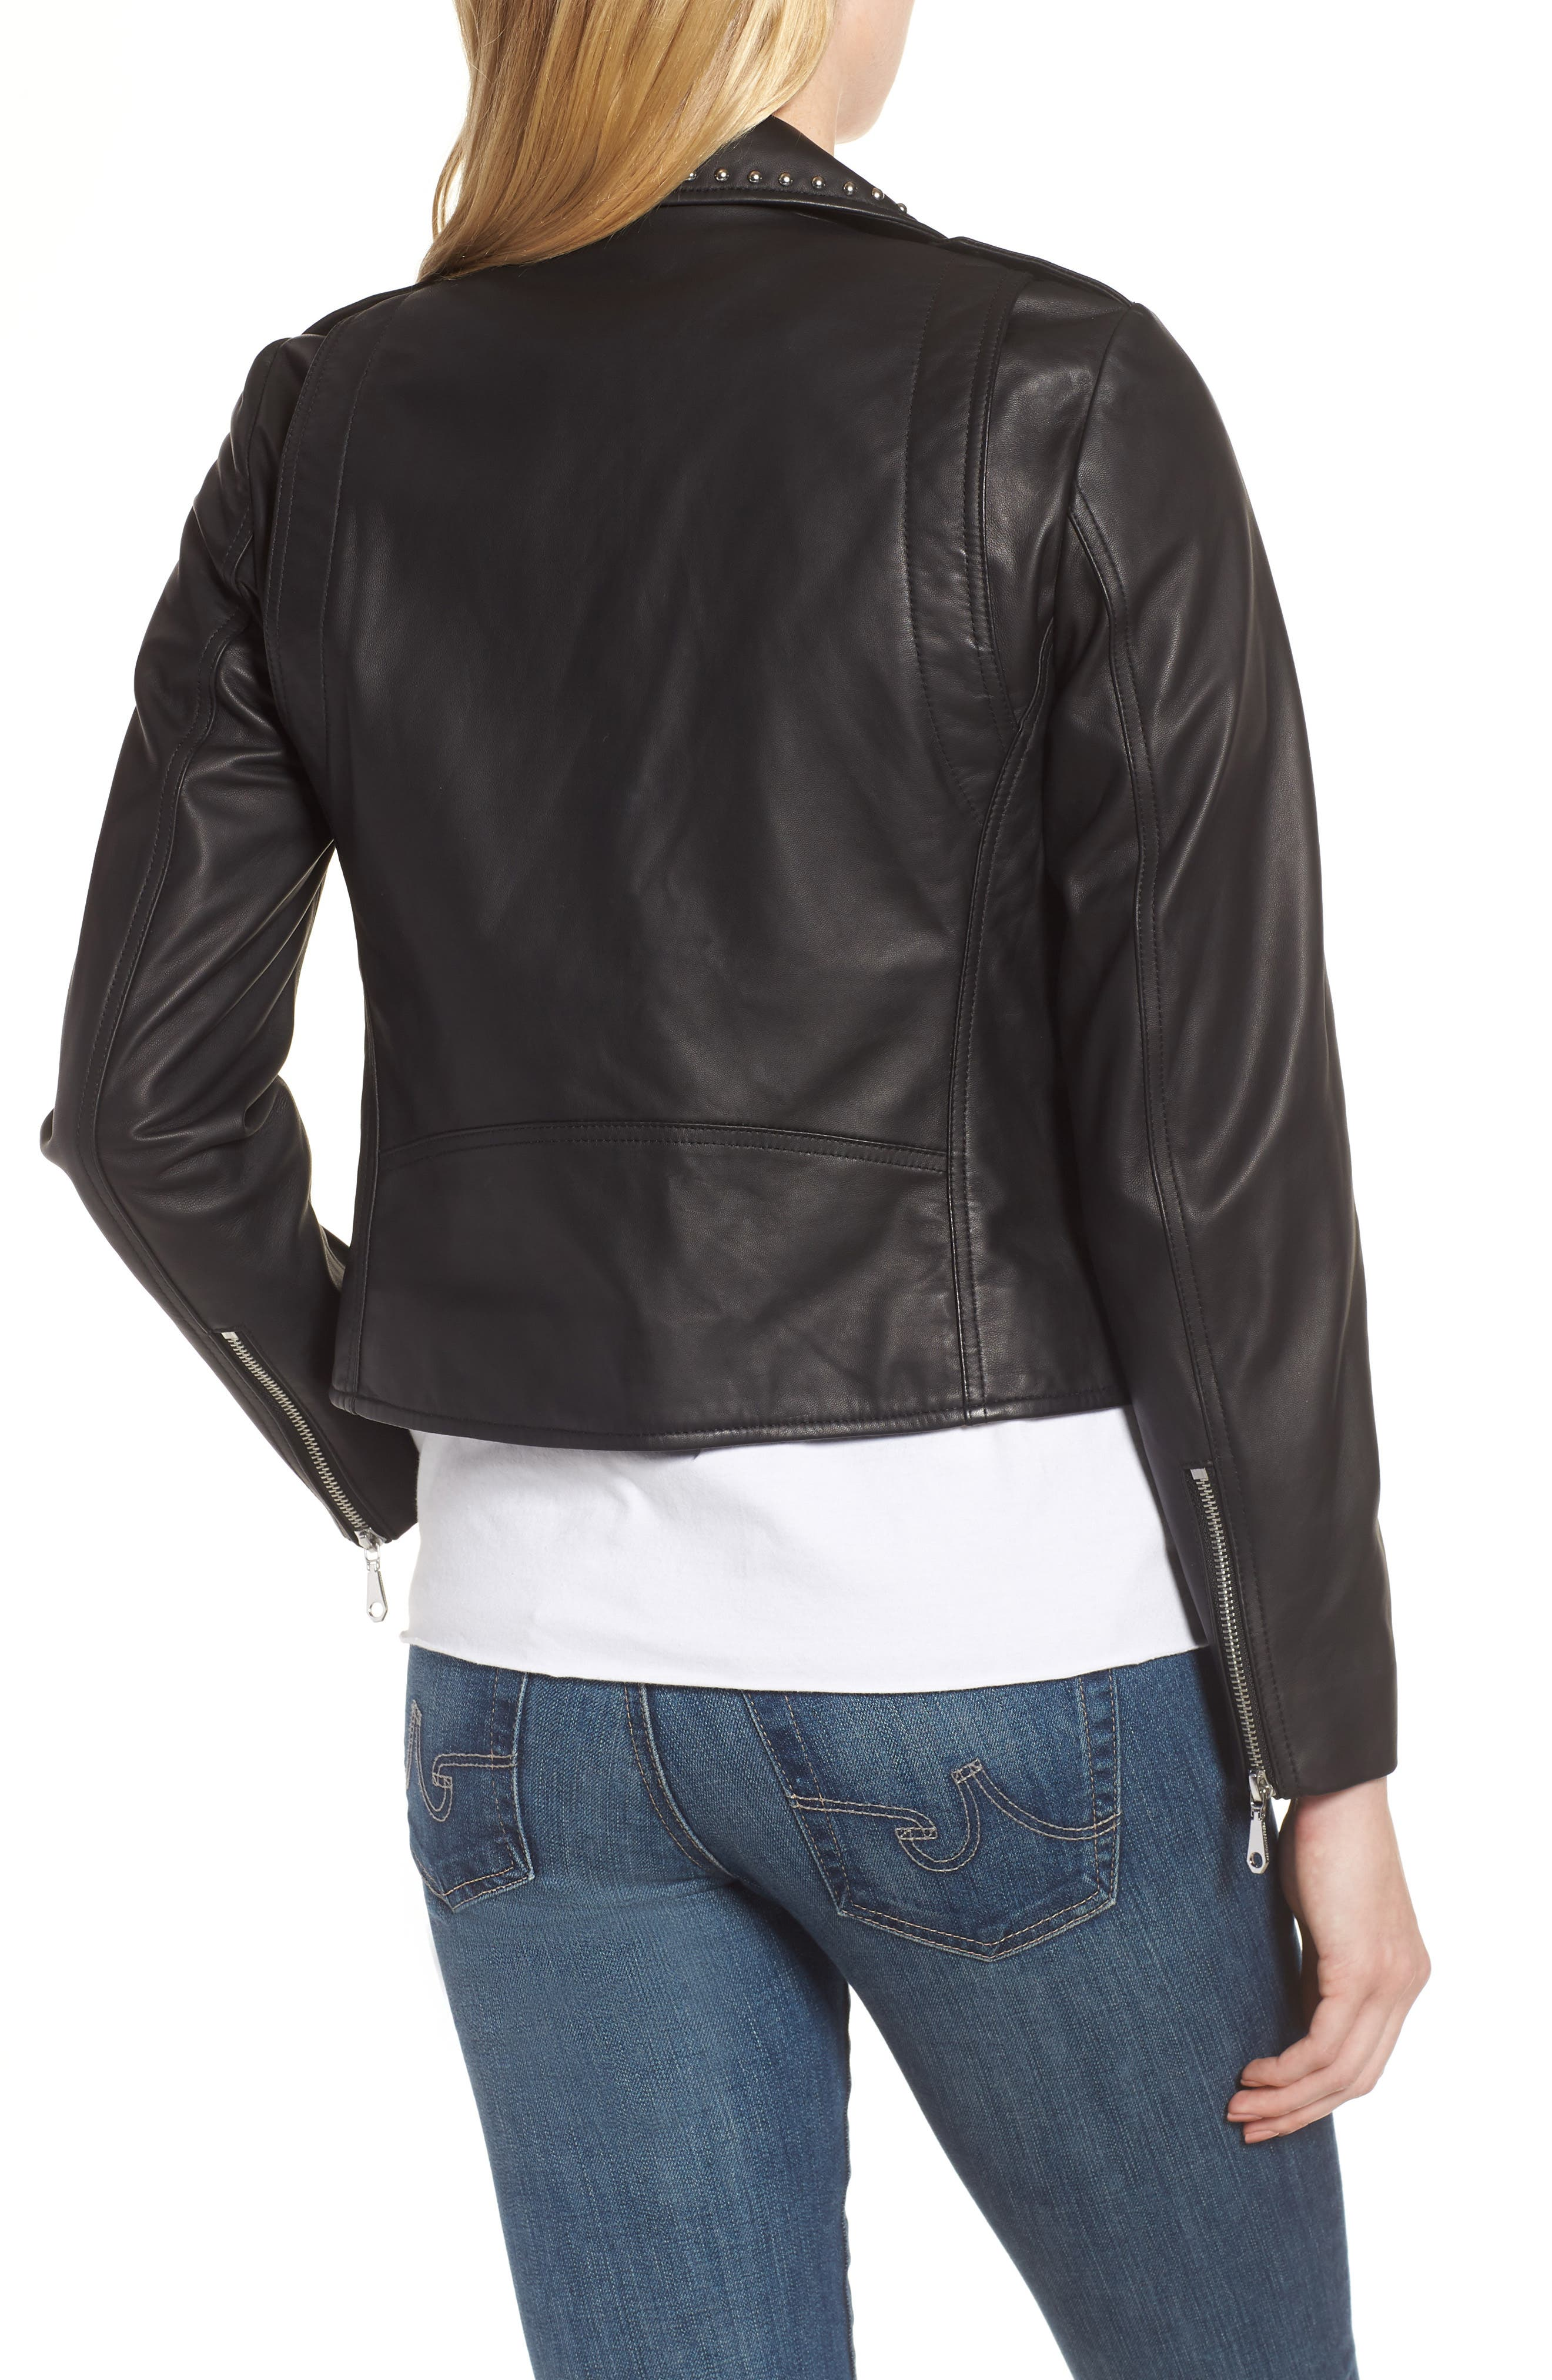 Wes Leather Moto Jacket,                             Alternate thumbnail 3, color,                             001